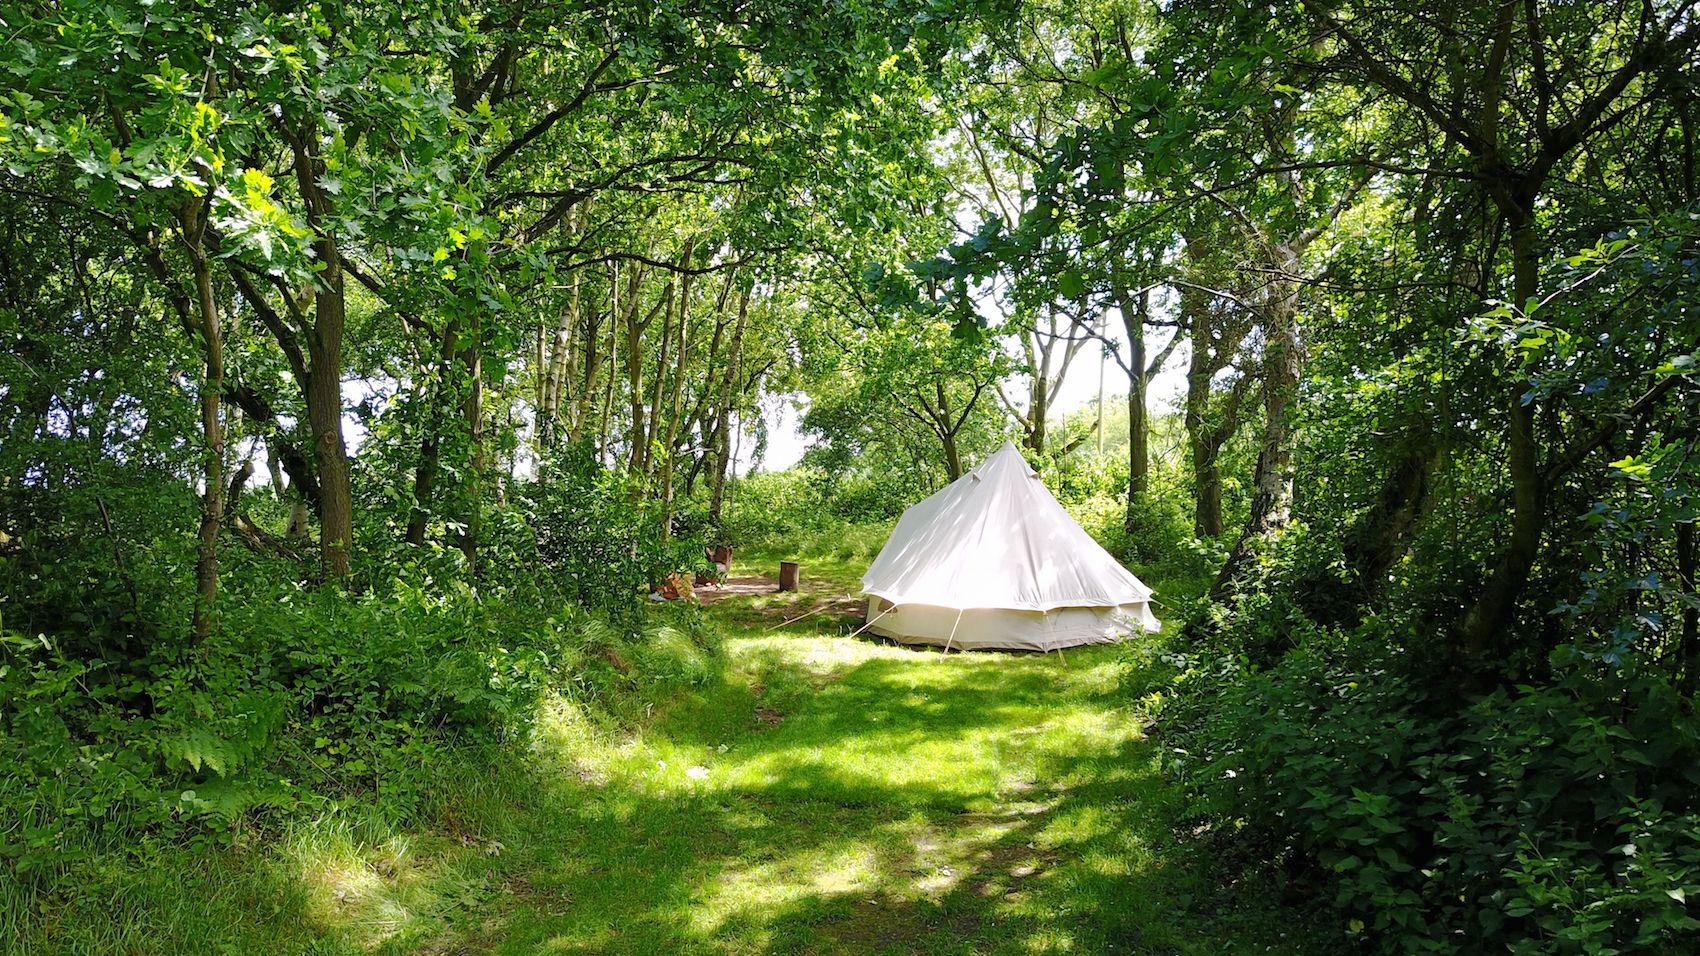 Book campsites near Happy Valley Norfolk